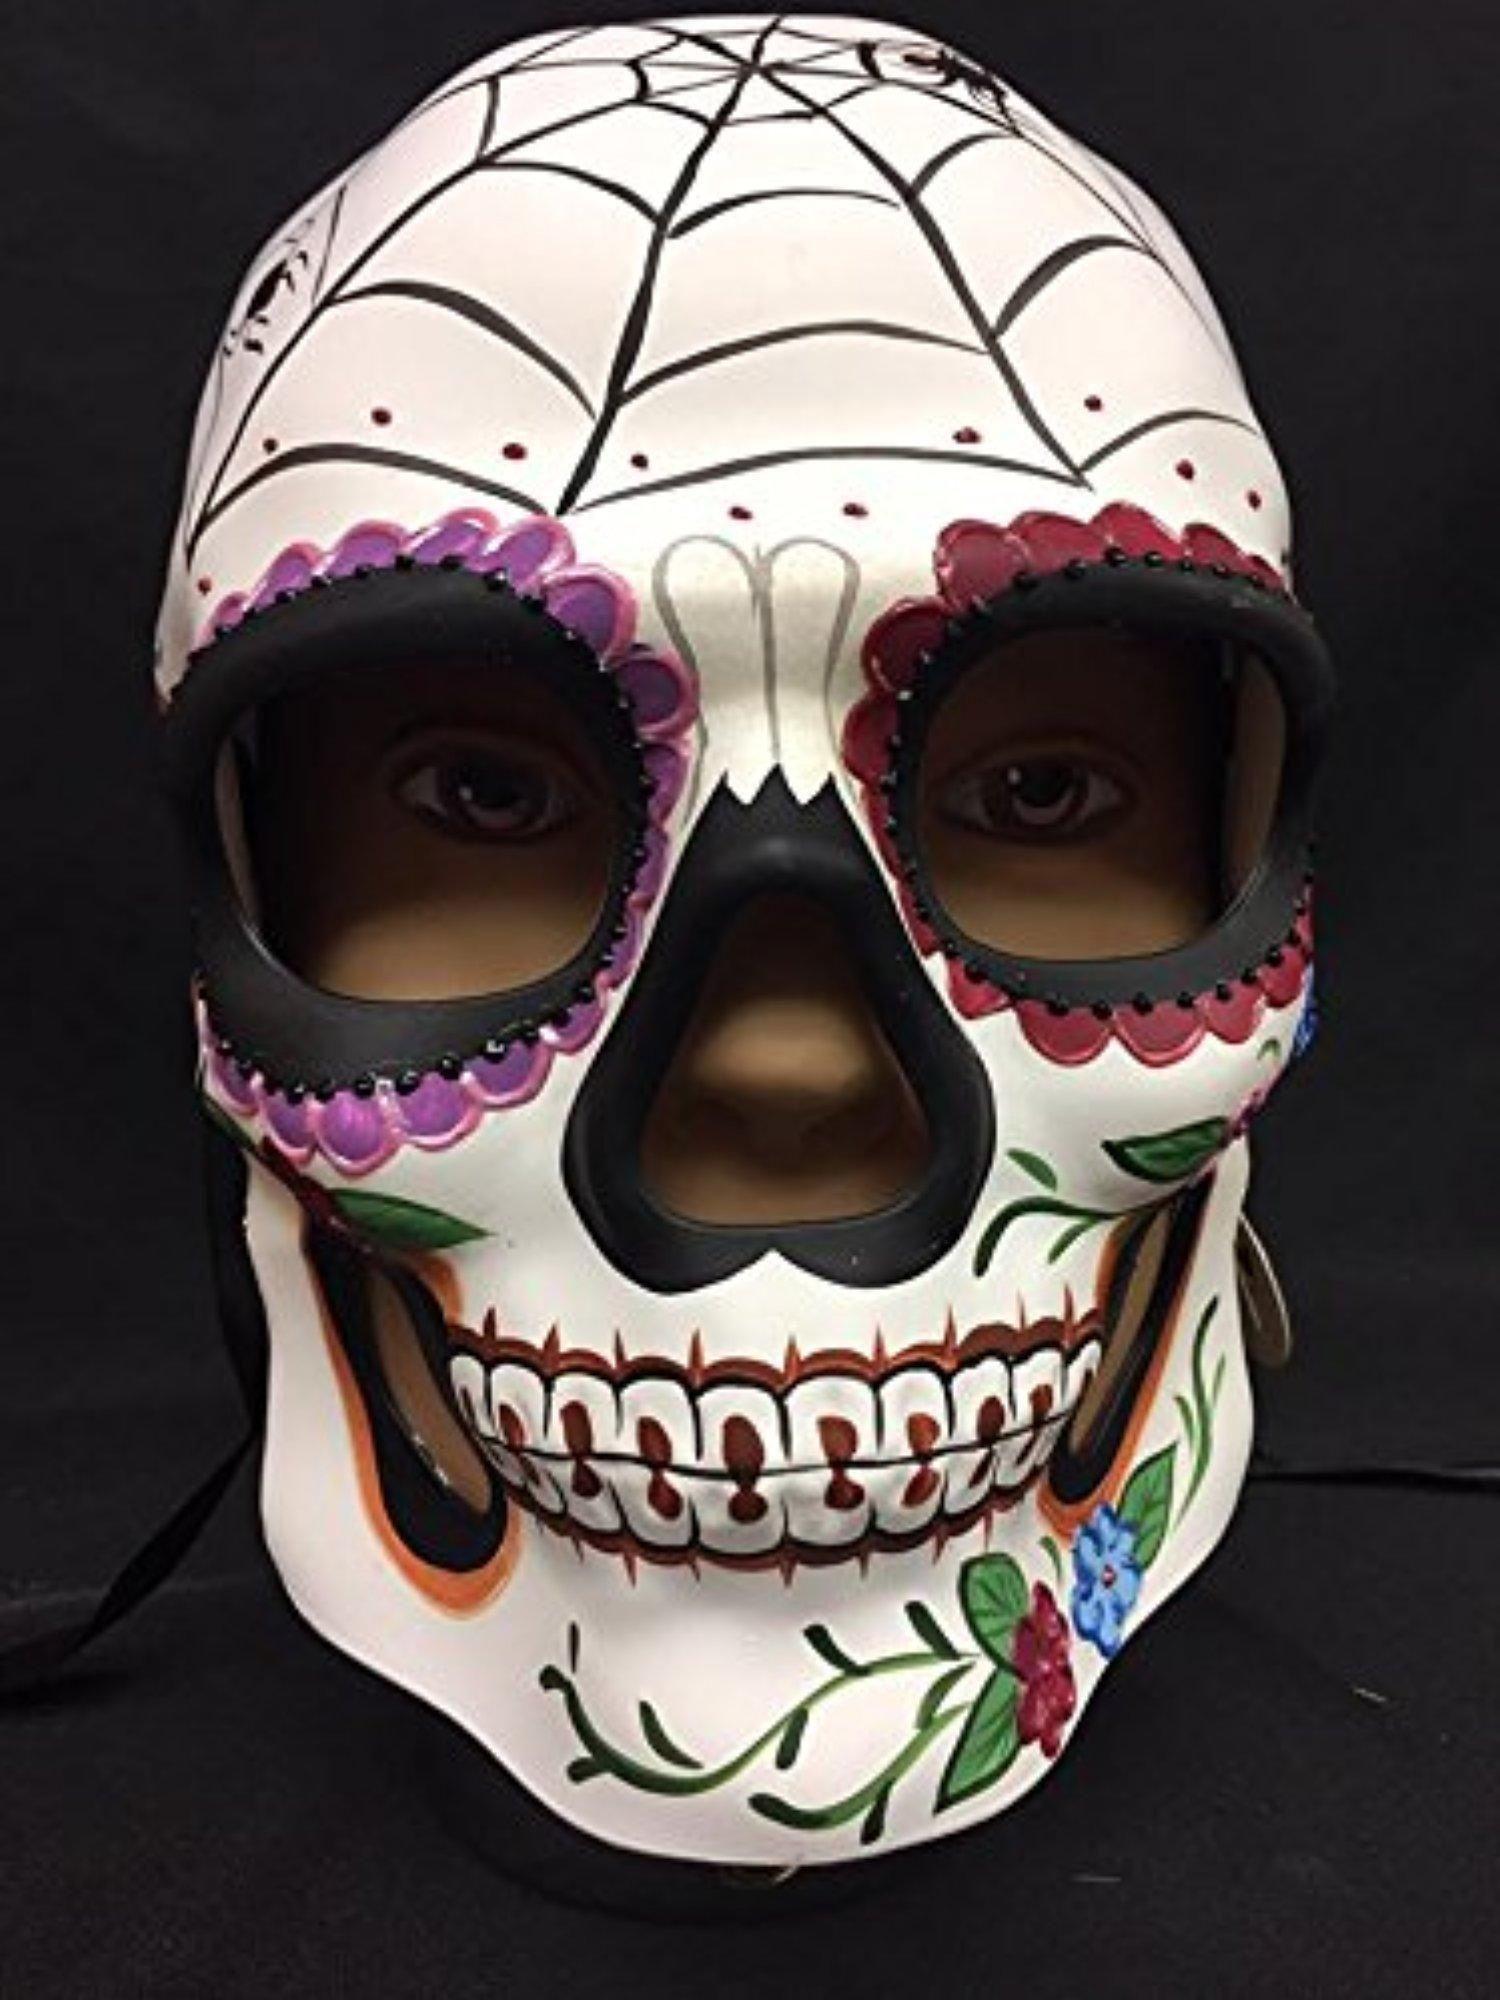 Spider Design Day Of The Dead Skull Mask Halloween Theme